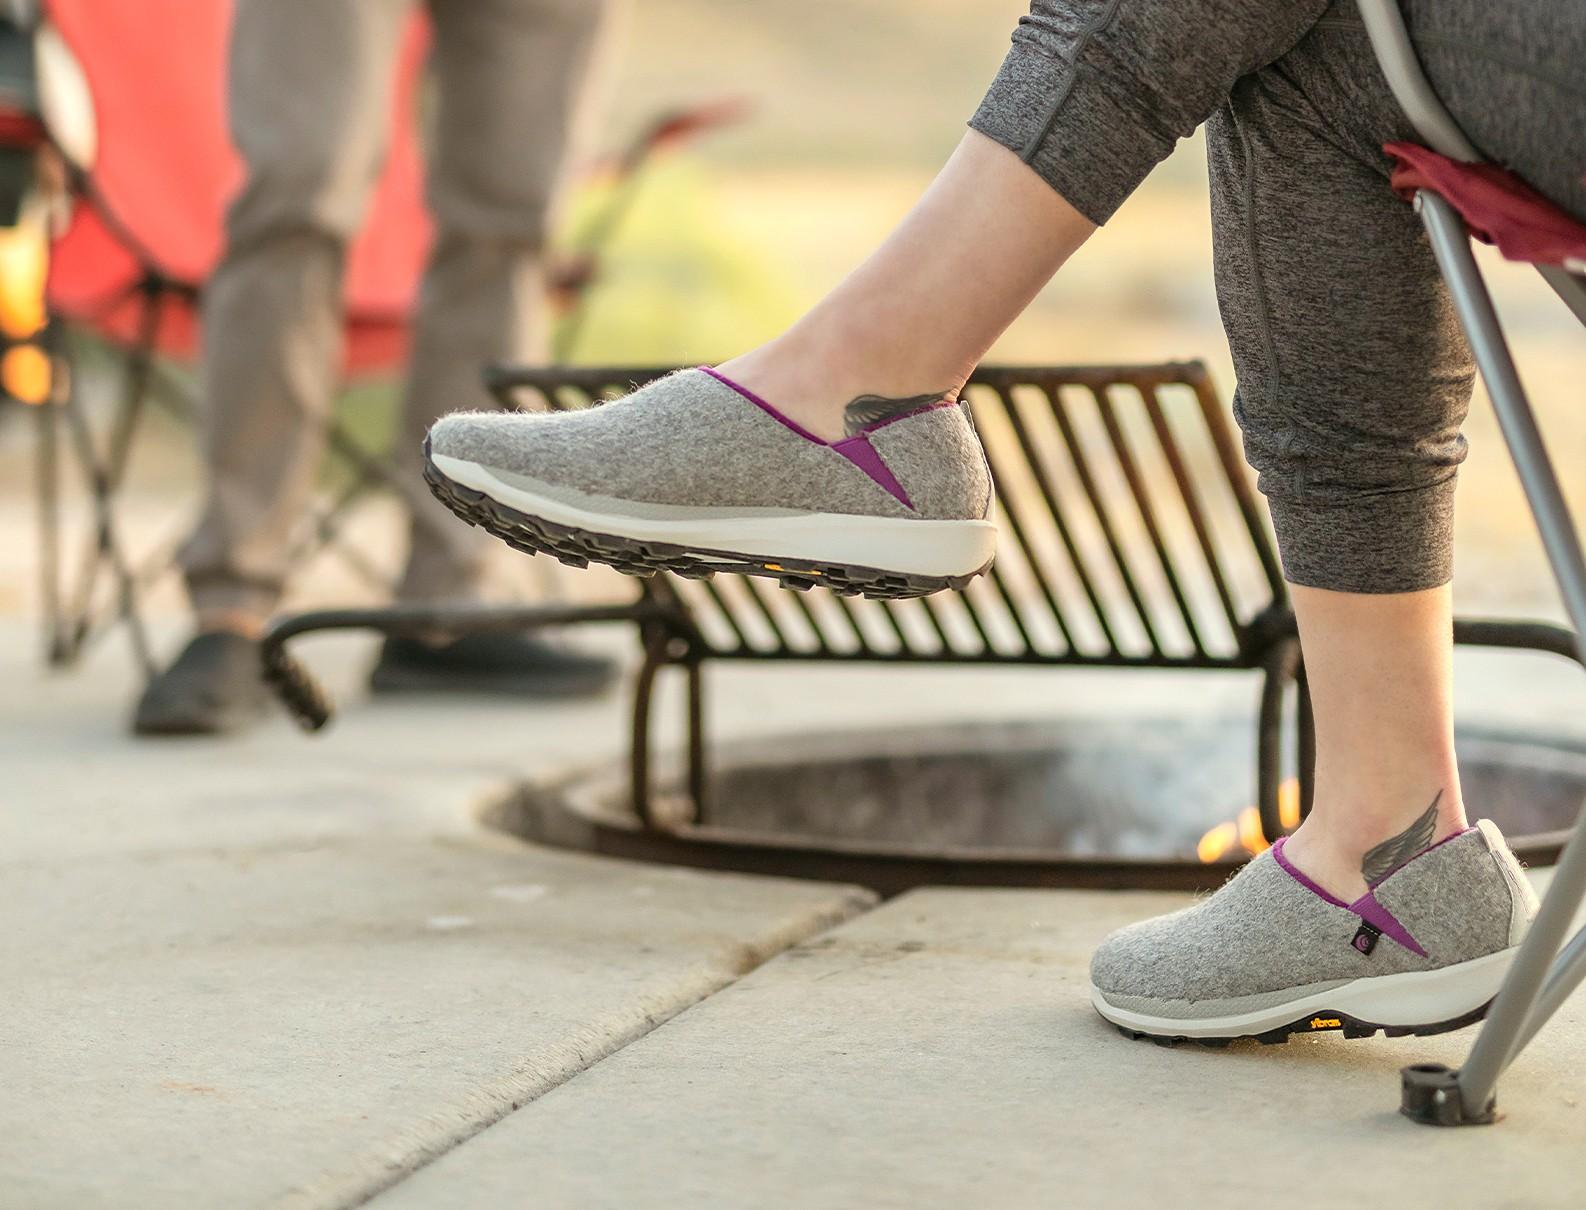 Rekovr 2 Women's Recovery Shoes | Topo